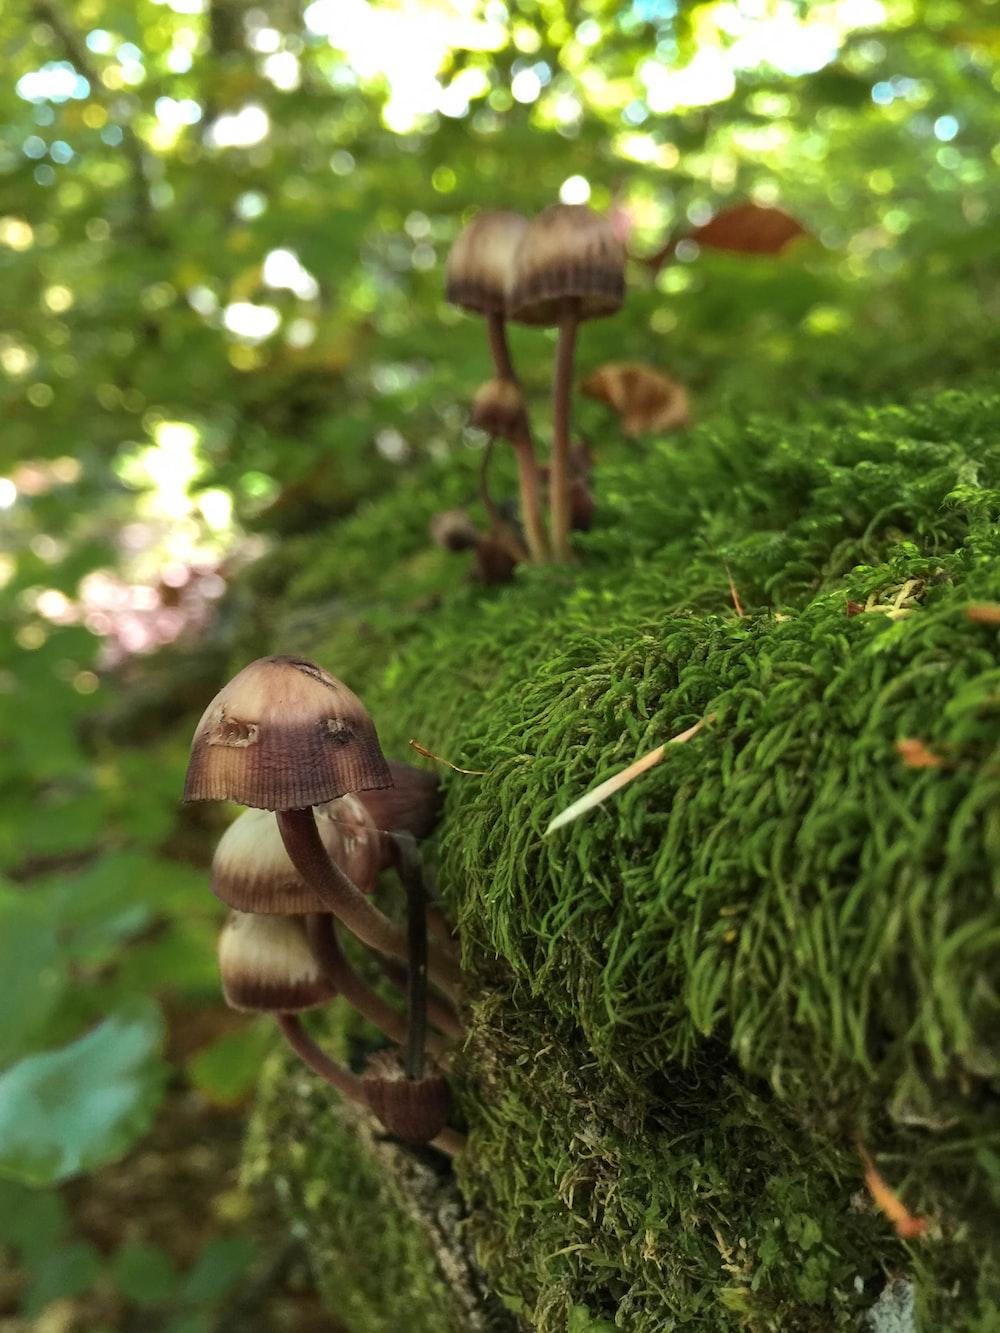 mushrooms on green plant